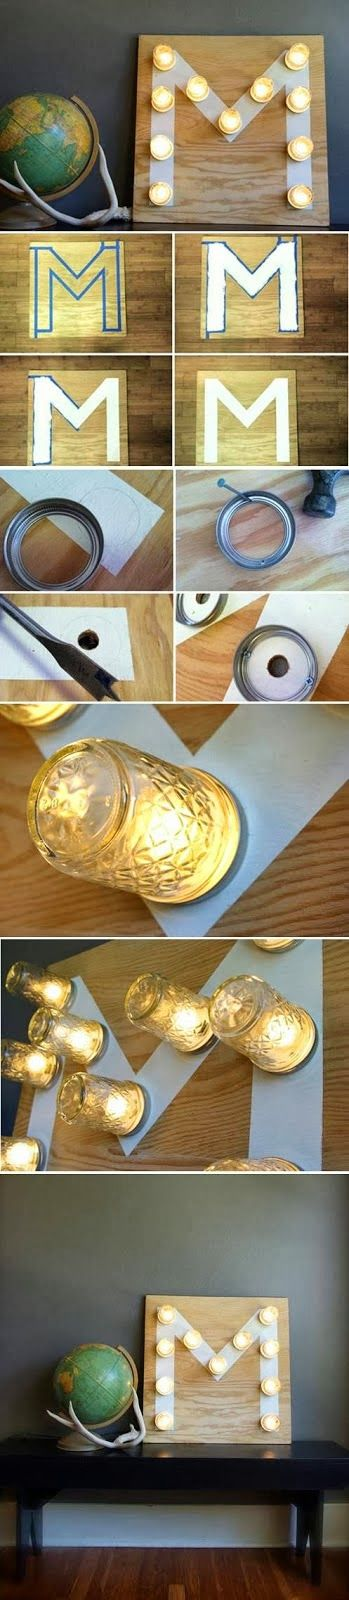 My DIY Projects: DIY Decorative Jar Light